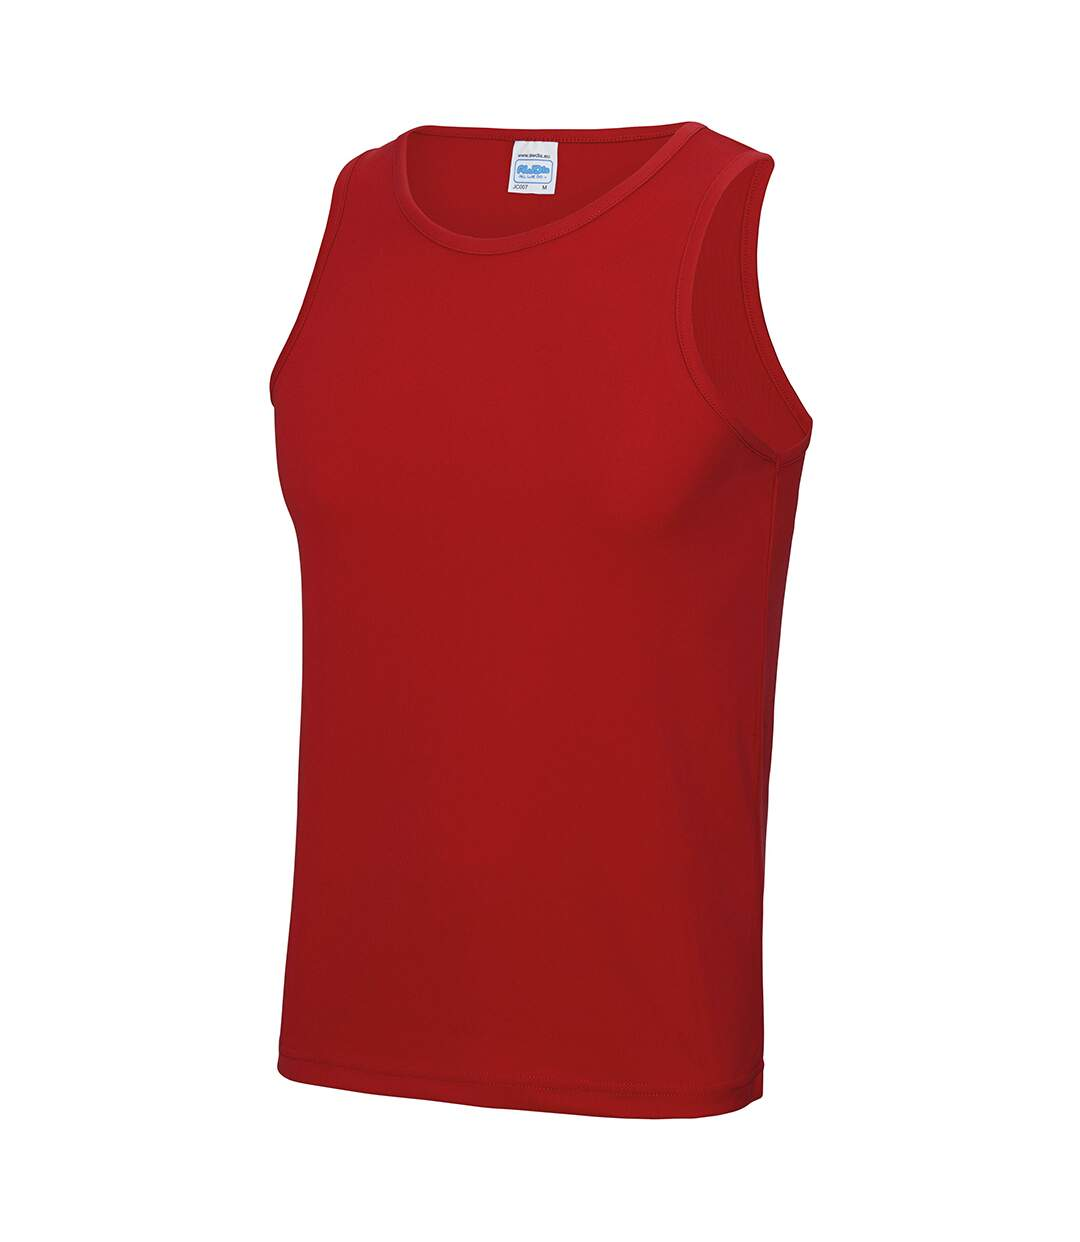 AWDis Just Cool Mens Sports Gym Plain Tank / Vest Top (Jet Black) - UTRW687